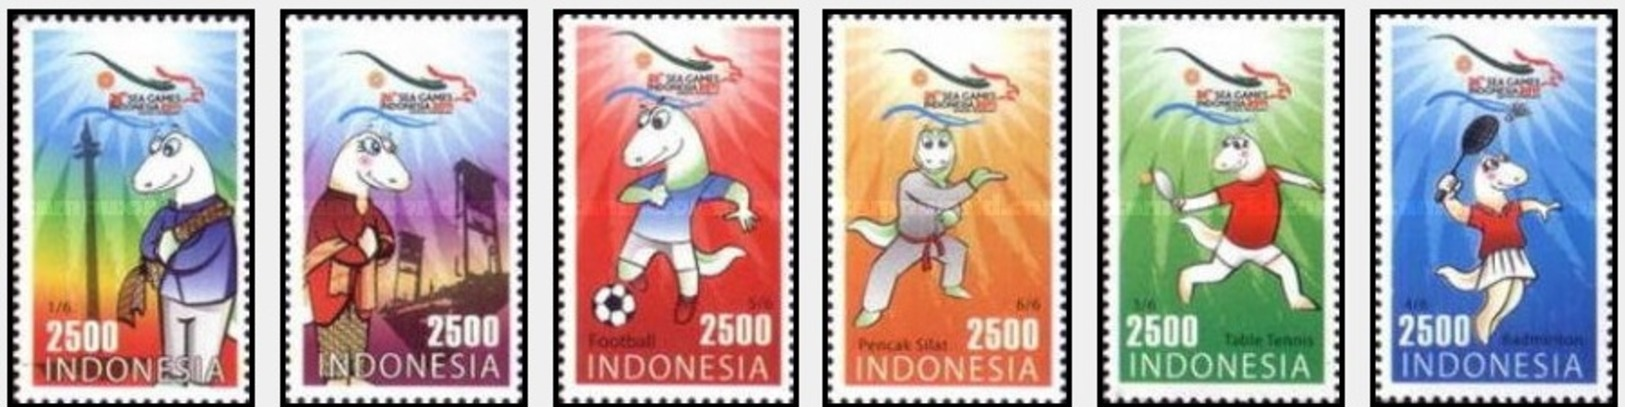 376Indonesia 2011 Asian Games - Indonesia